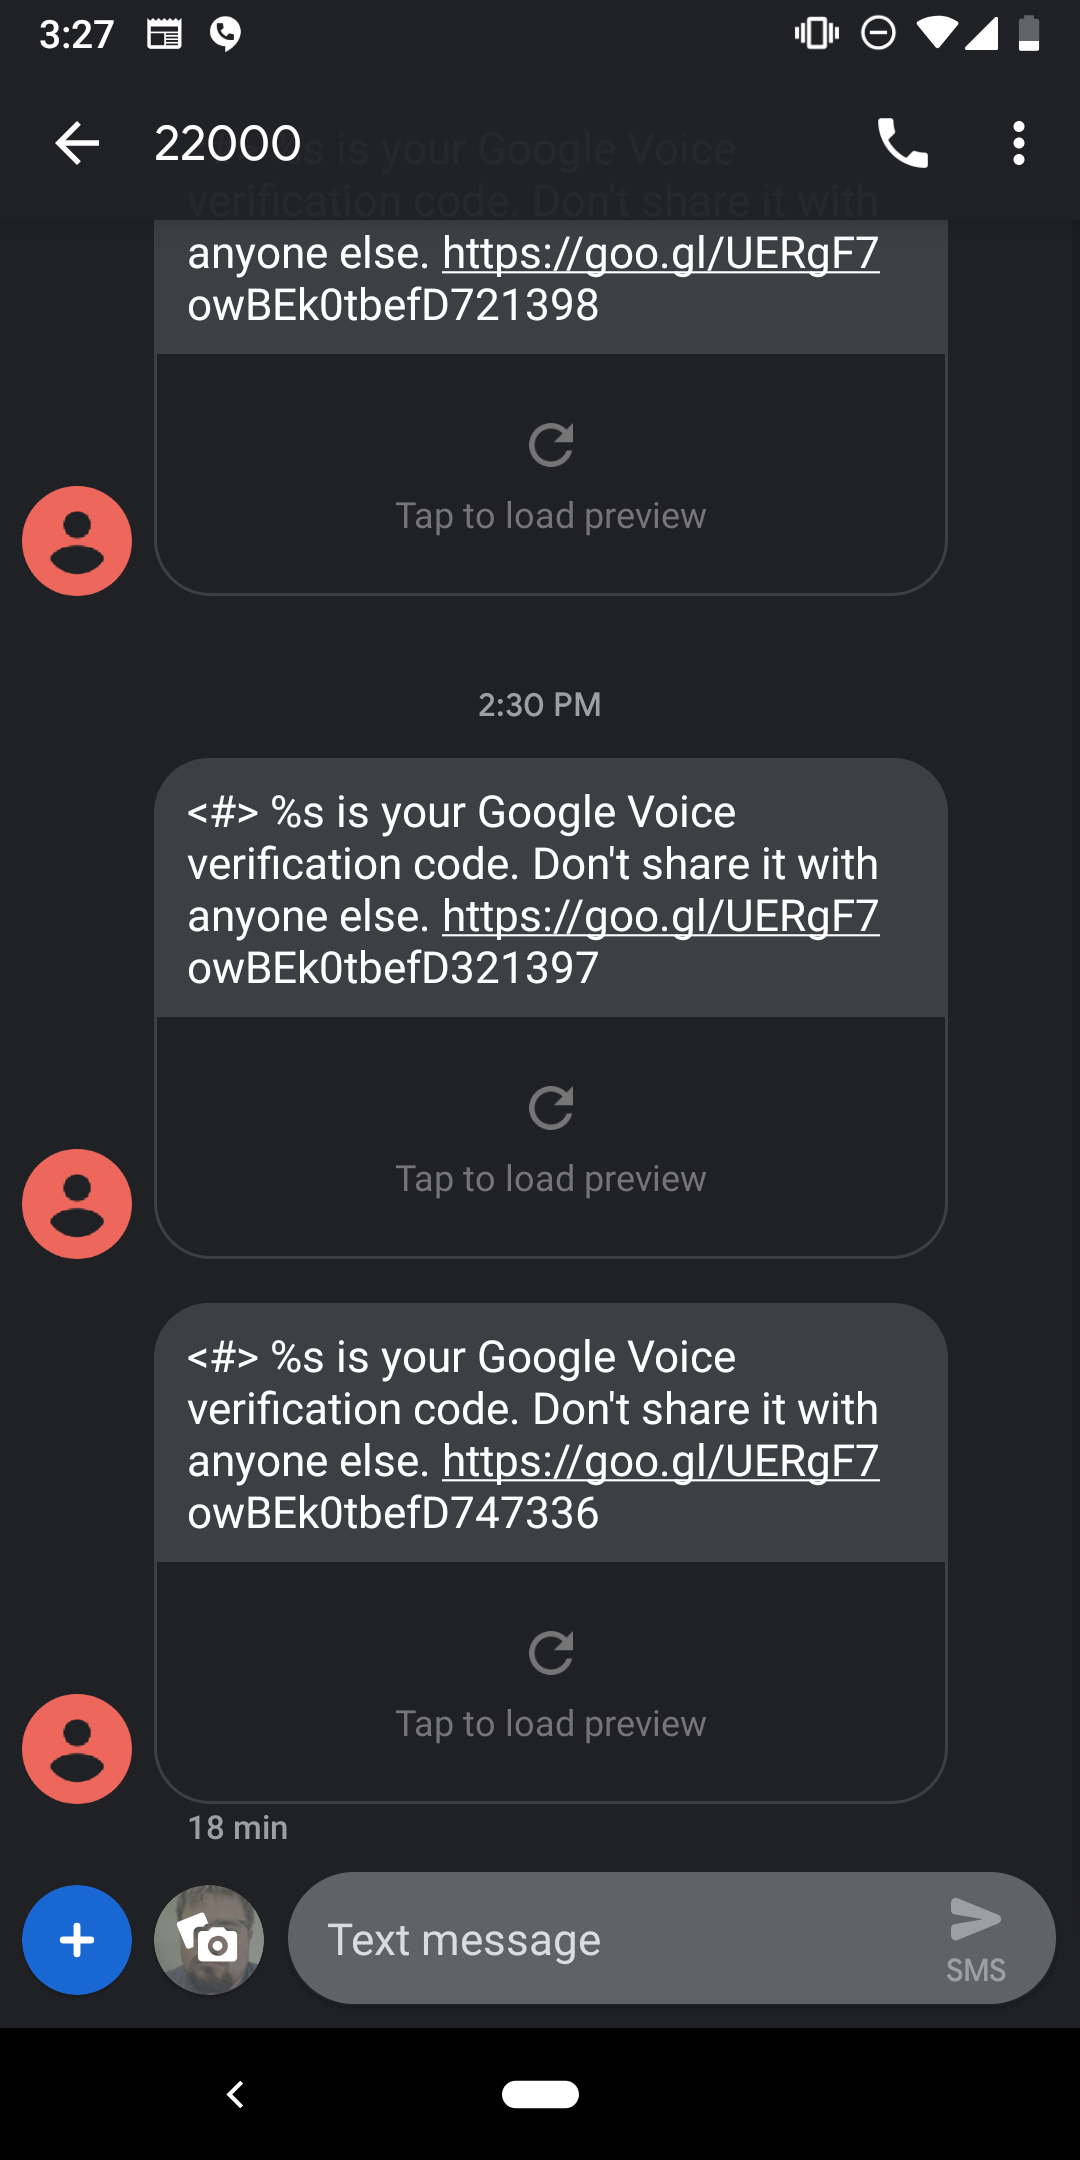 google voice verification code